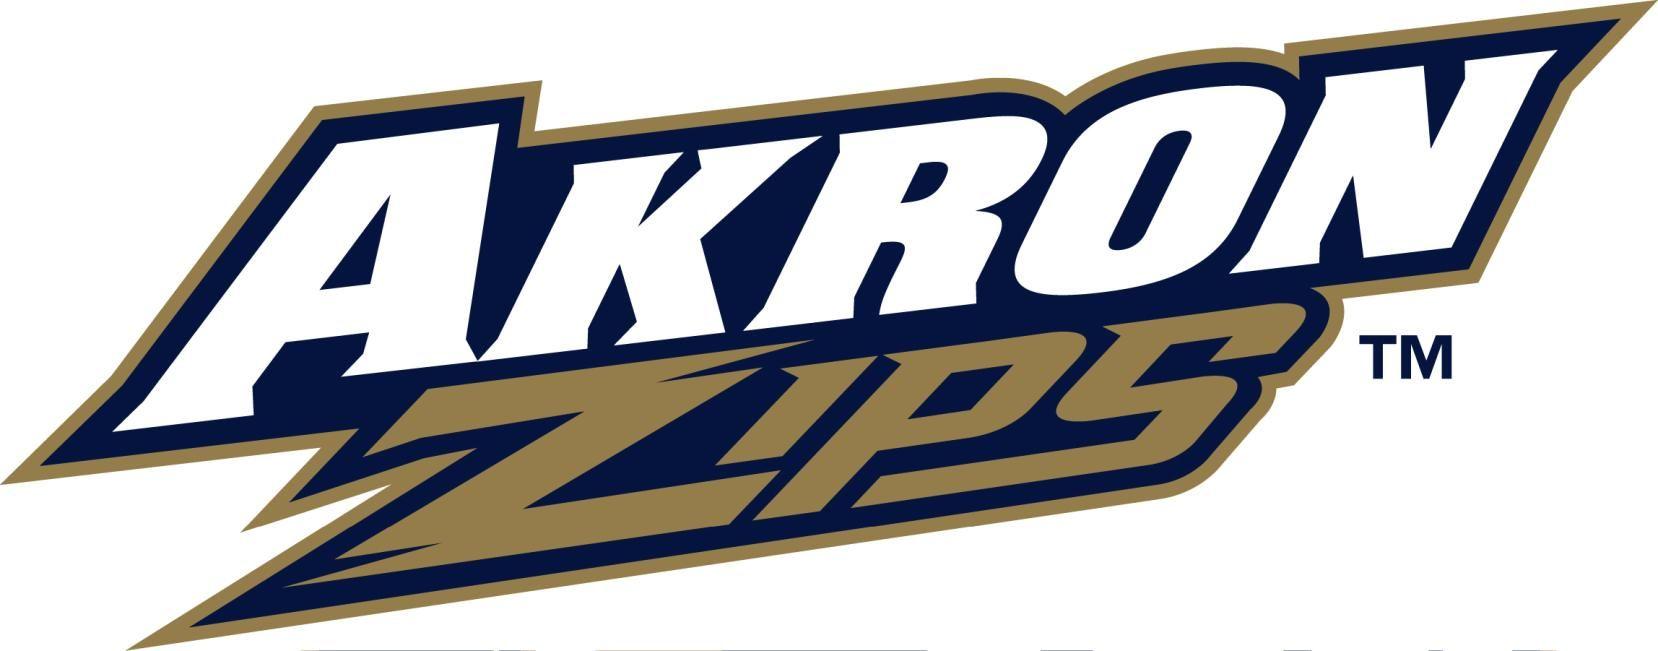 Image result for akron zips football logo